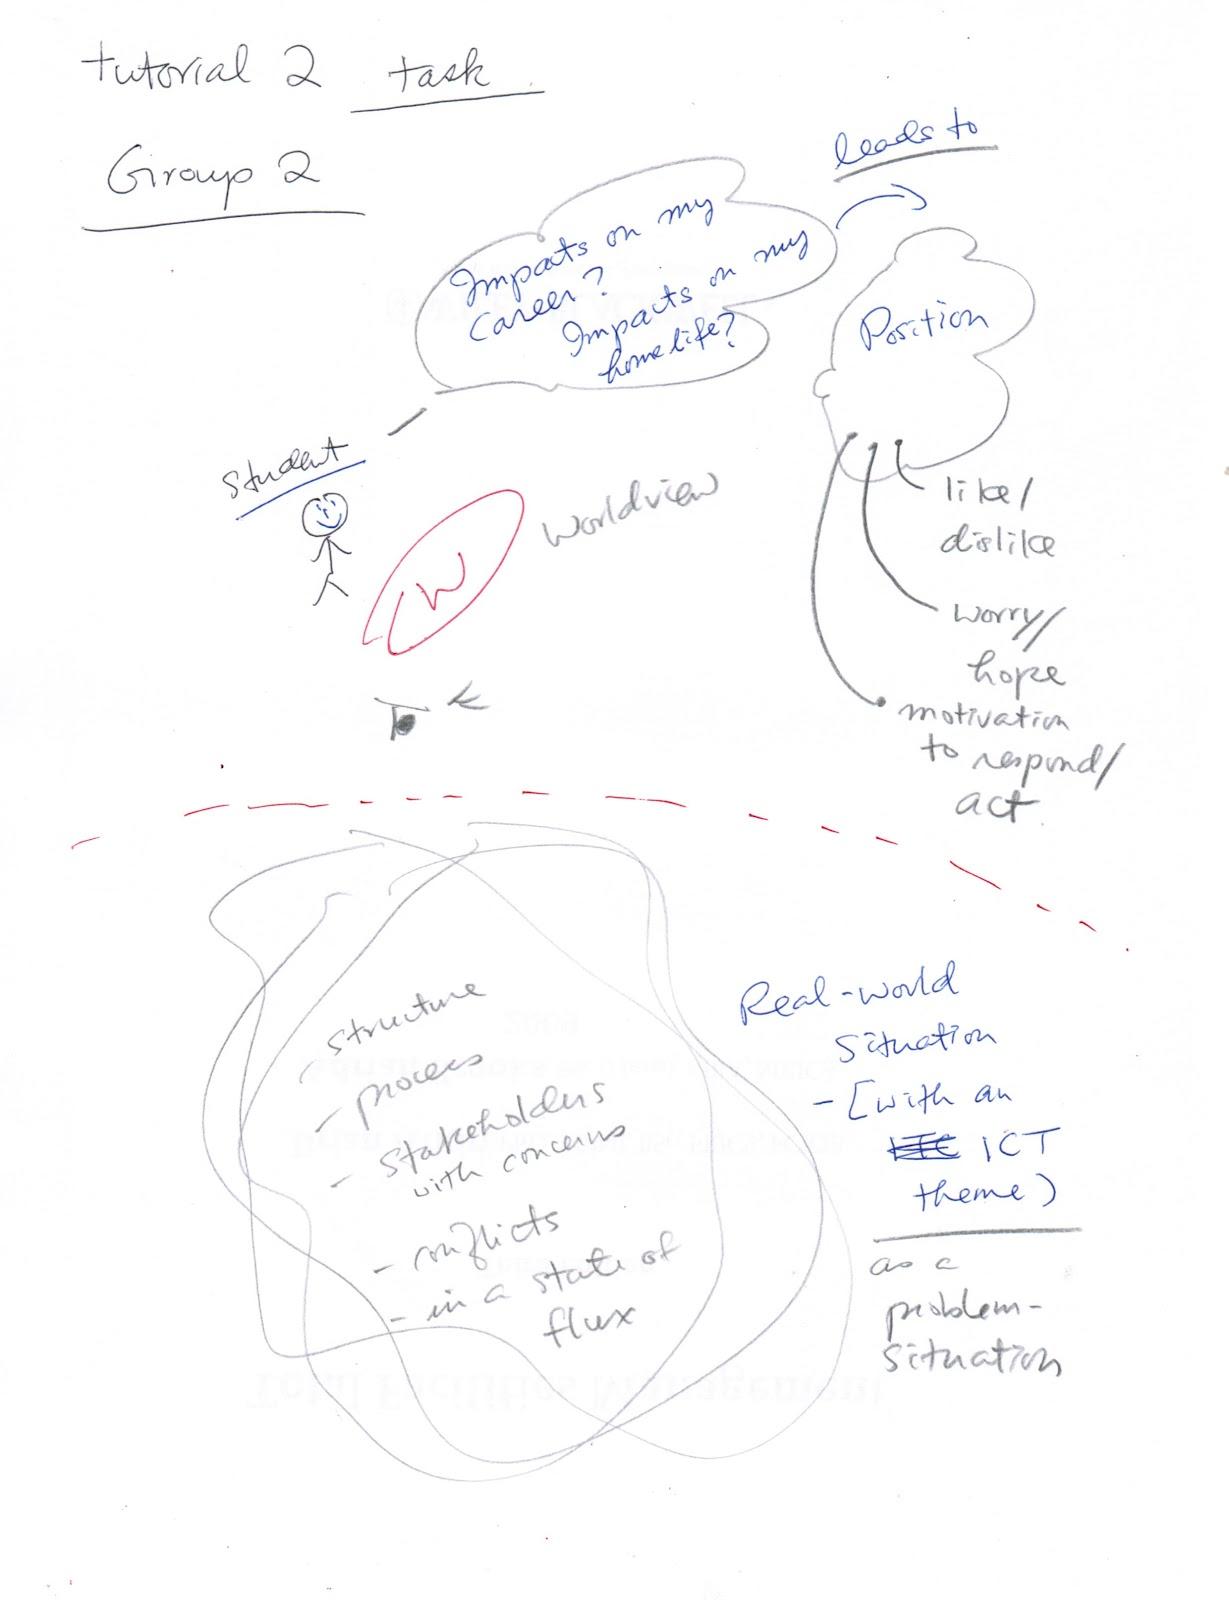 NCC Research in IT tutorials 1 & 2 tasks